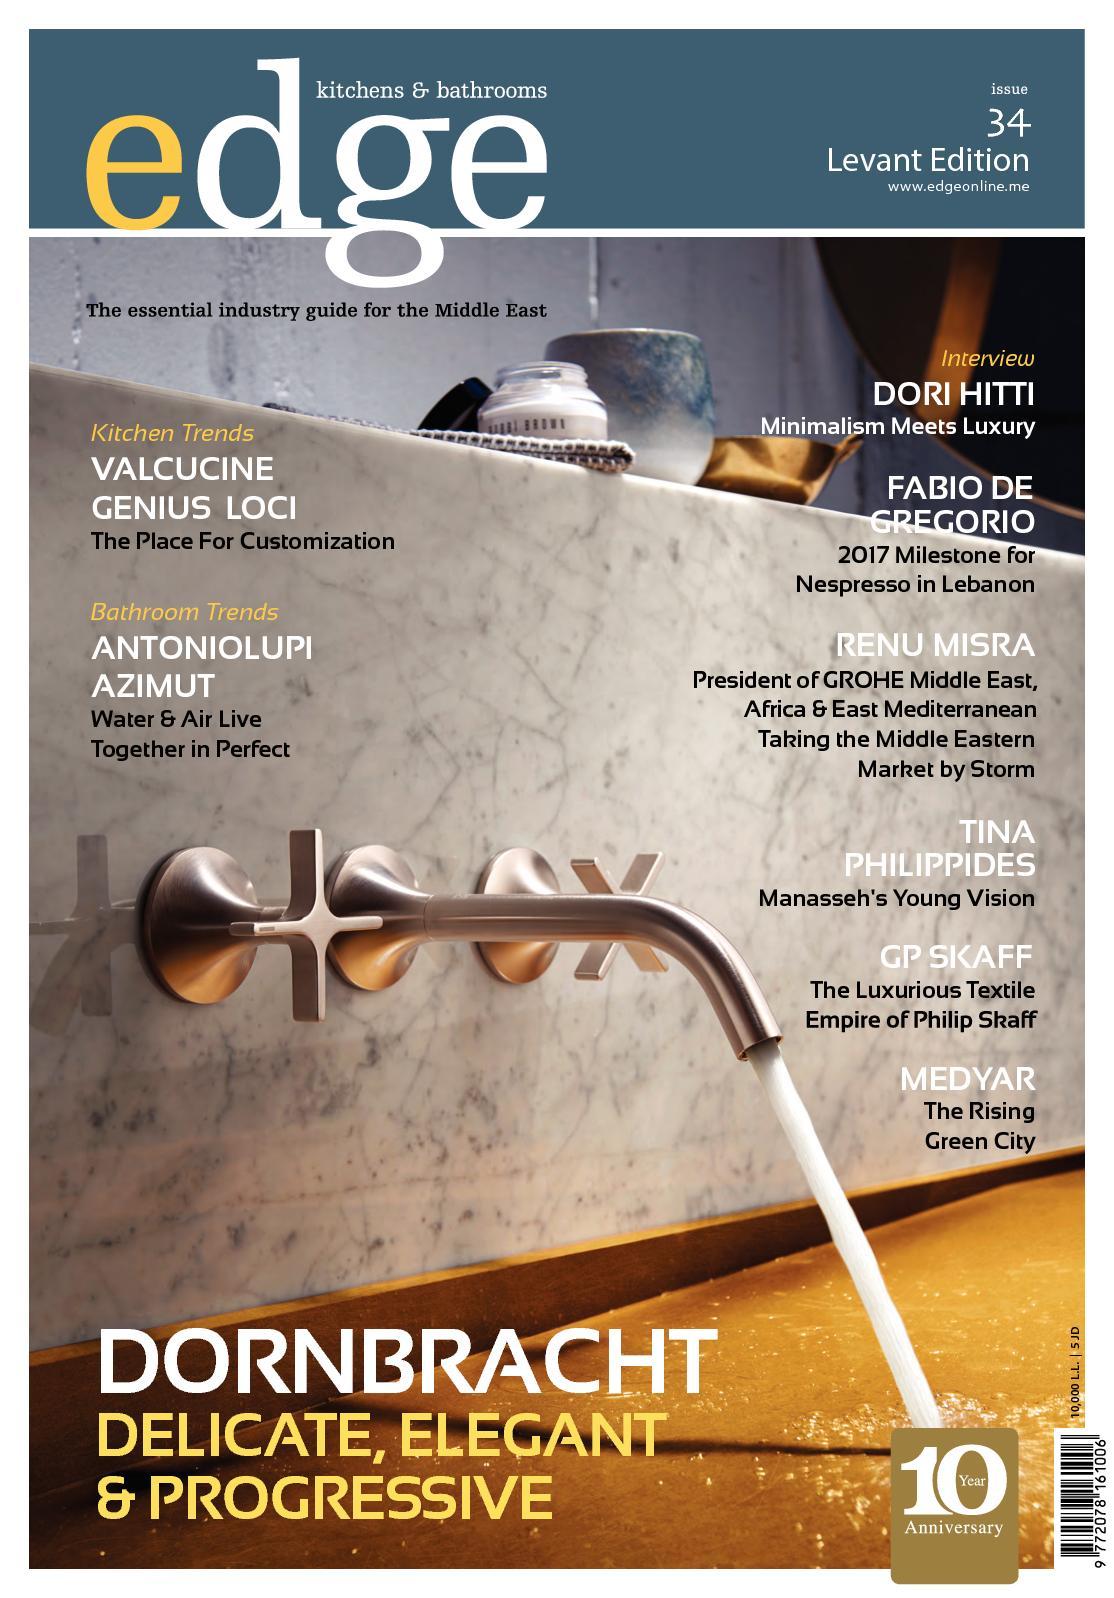 Calaméo - Edge_Nov_Issue34